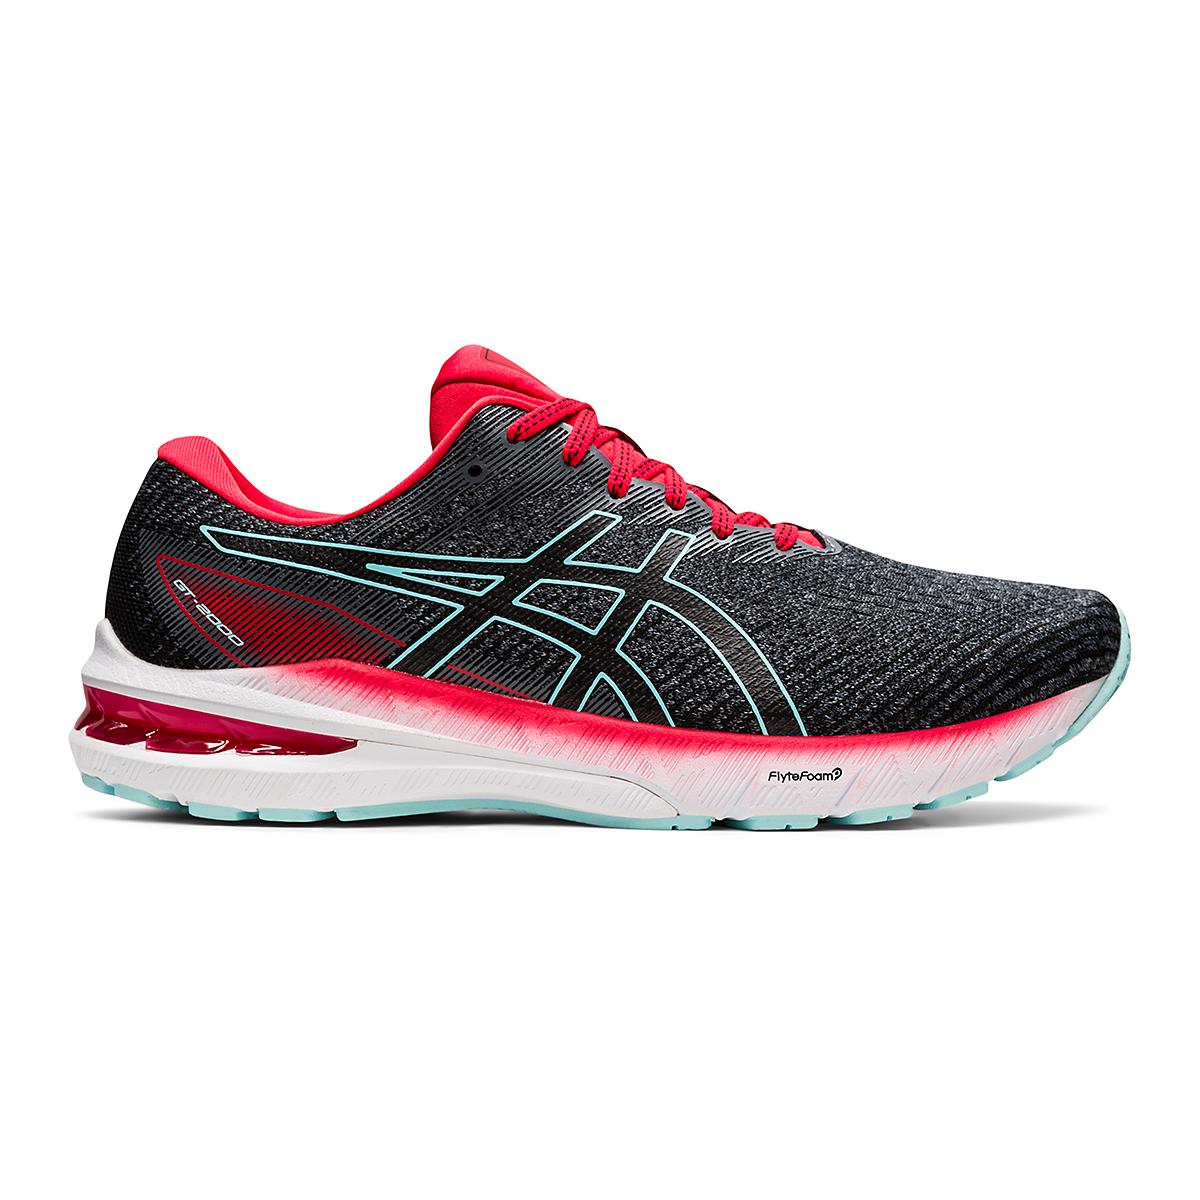 Men's Asics GT-2000 10 Running Shoe - Color: Metropolis/Electric Red - Size: 7 - Width: Regular, Metropolis/Electric Red, large, image 1